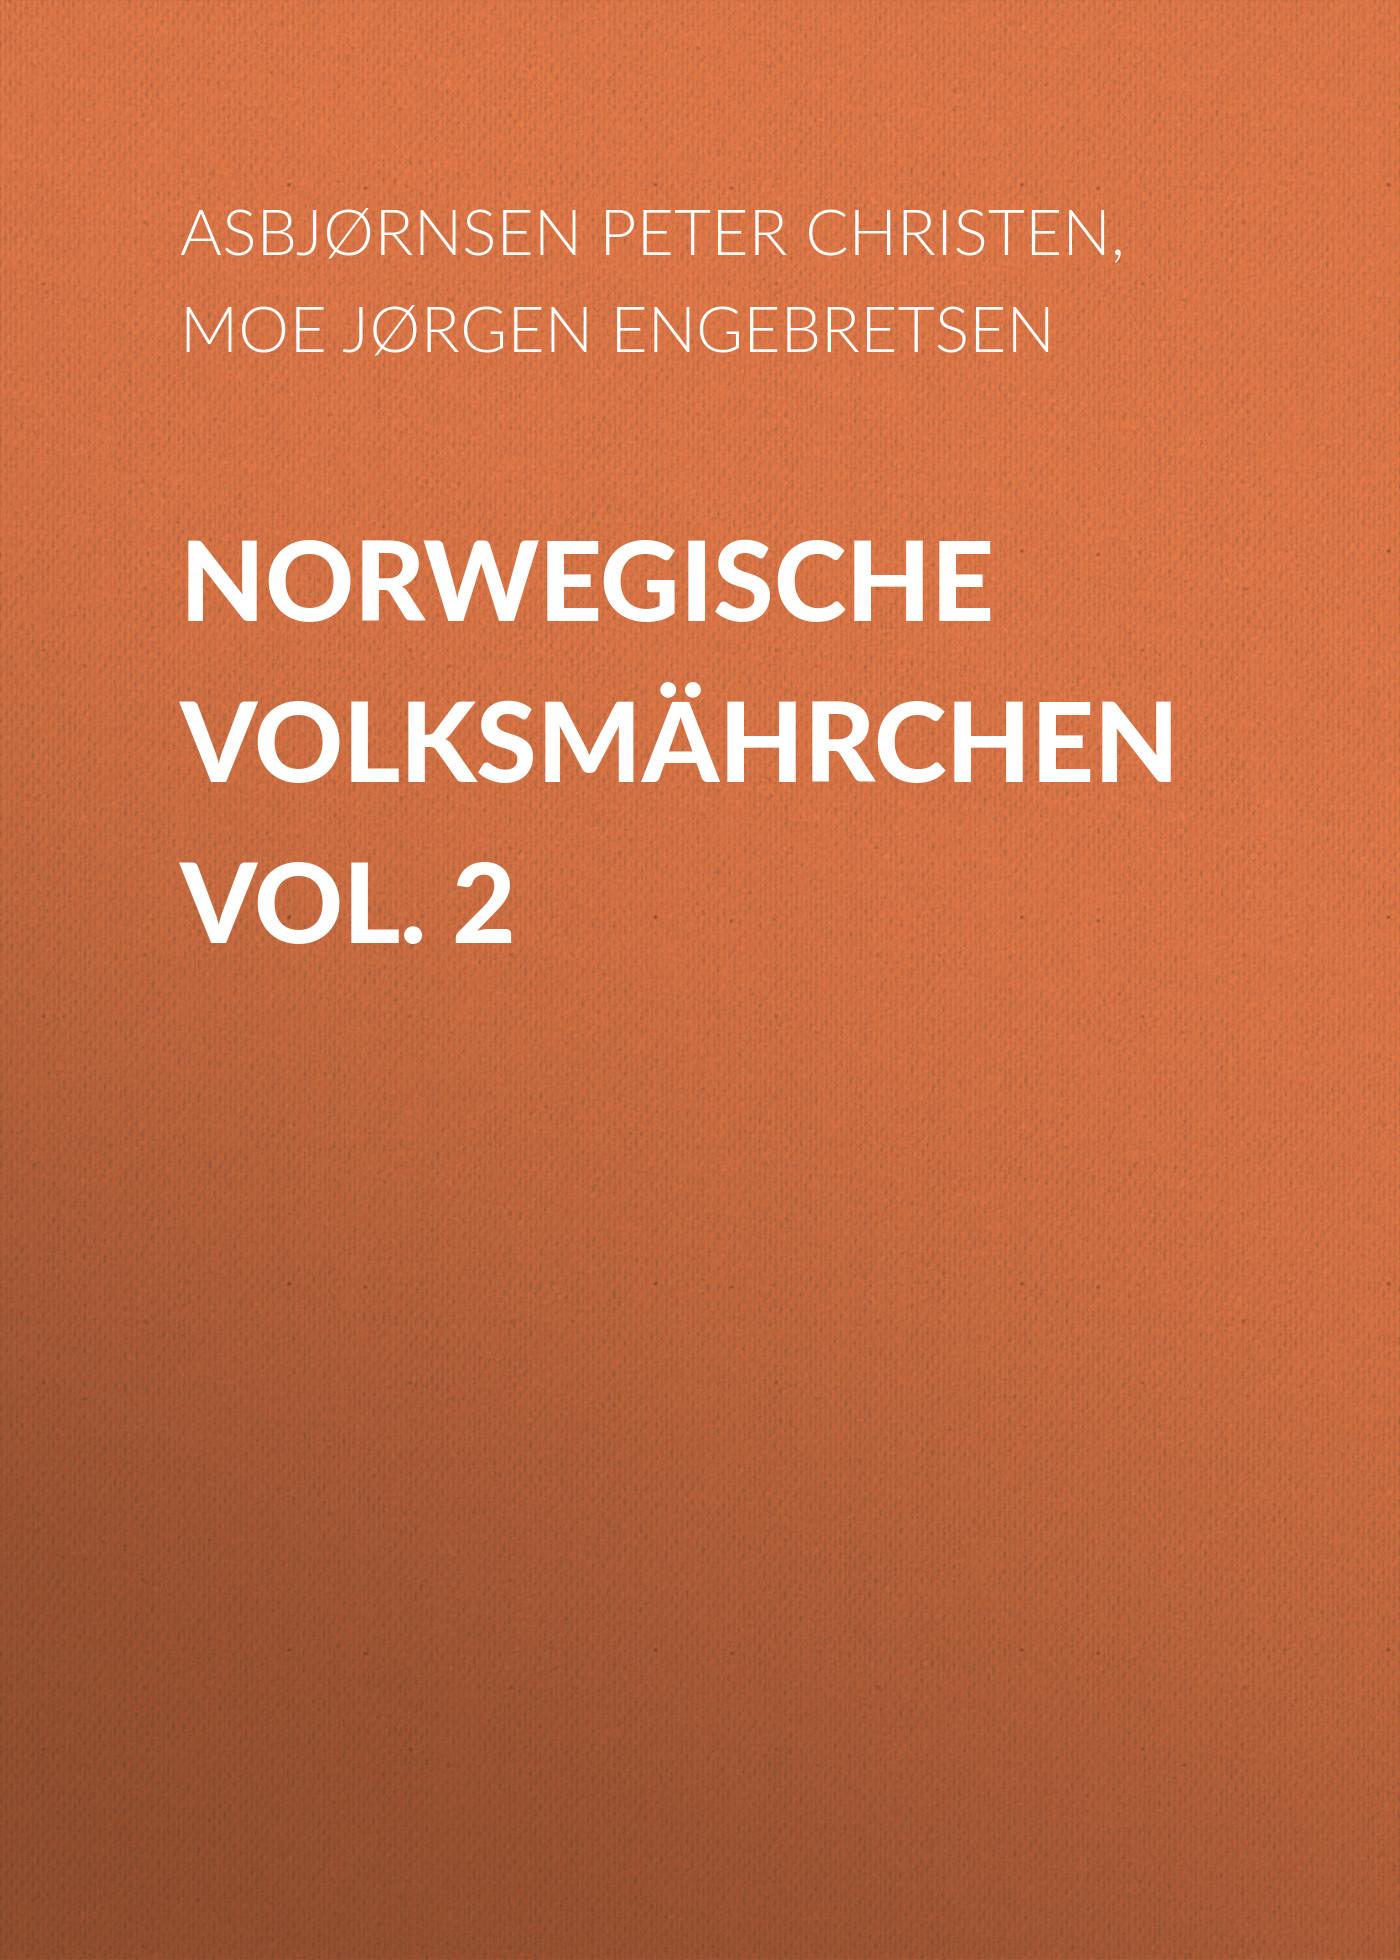 Asbjørnsen Peter Christen Norwegische Volksmährchen vol. 2 gantz tpb vol 34